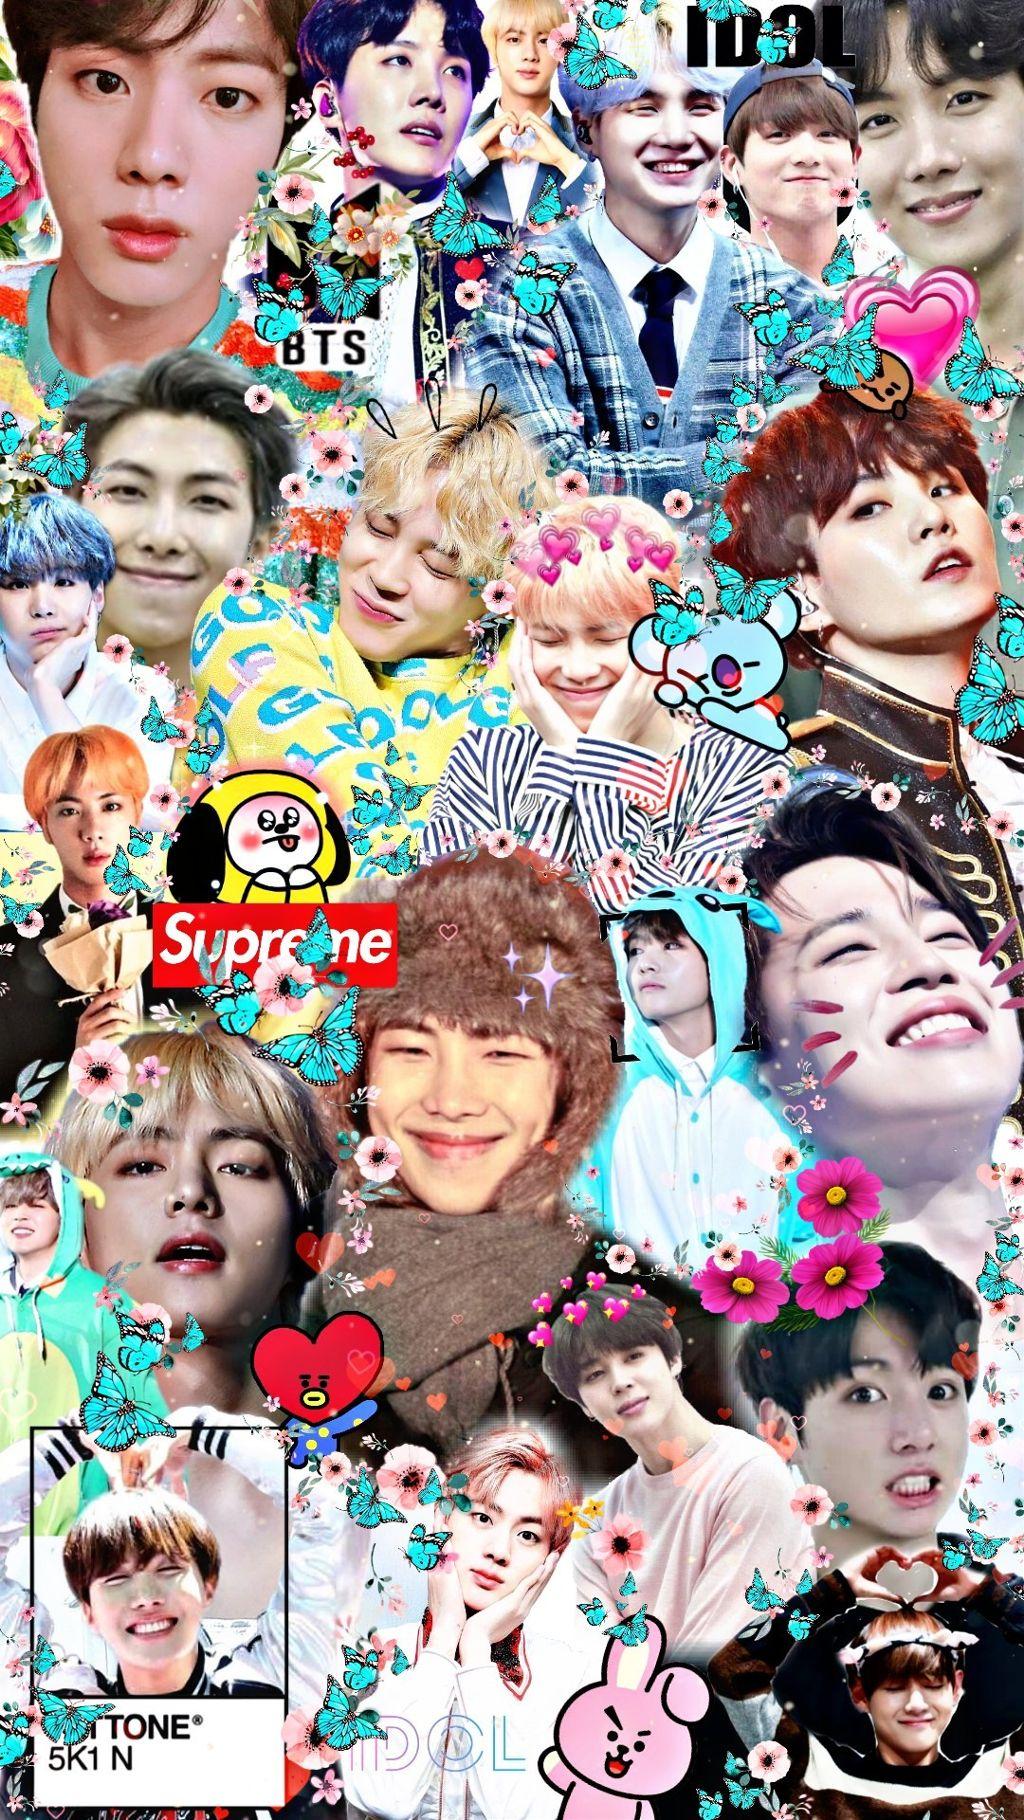 Download 400 Wallpaper Bts Collage